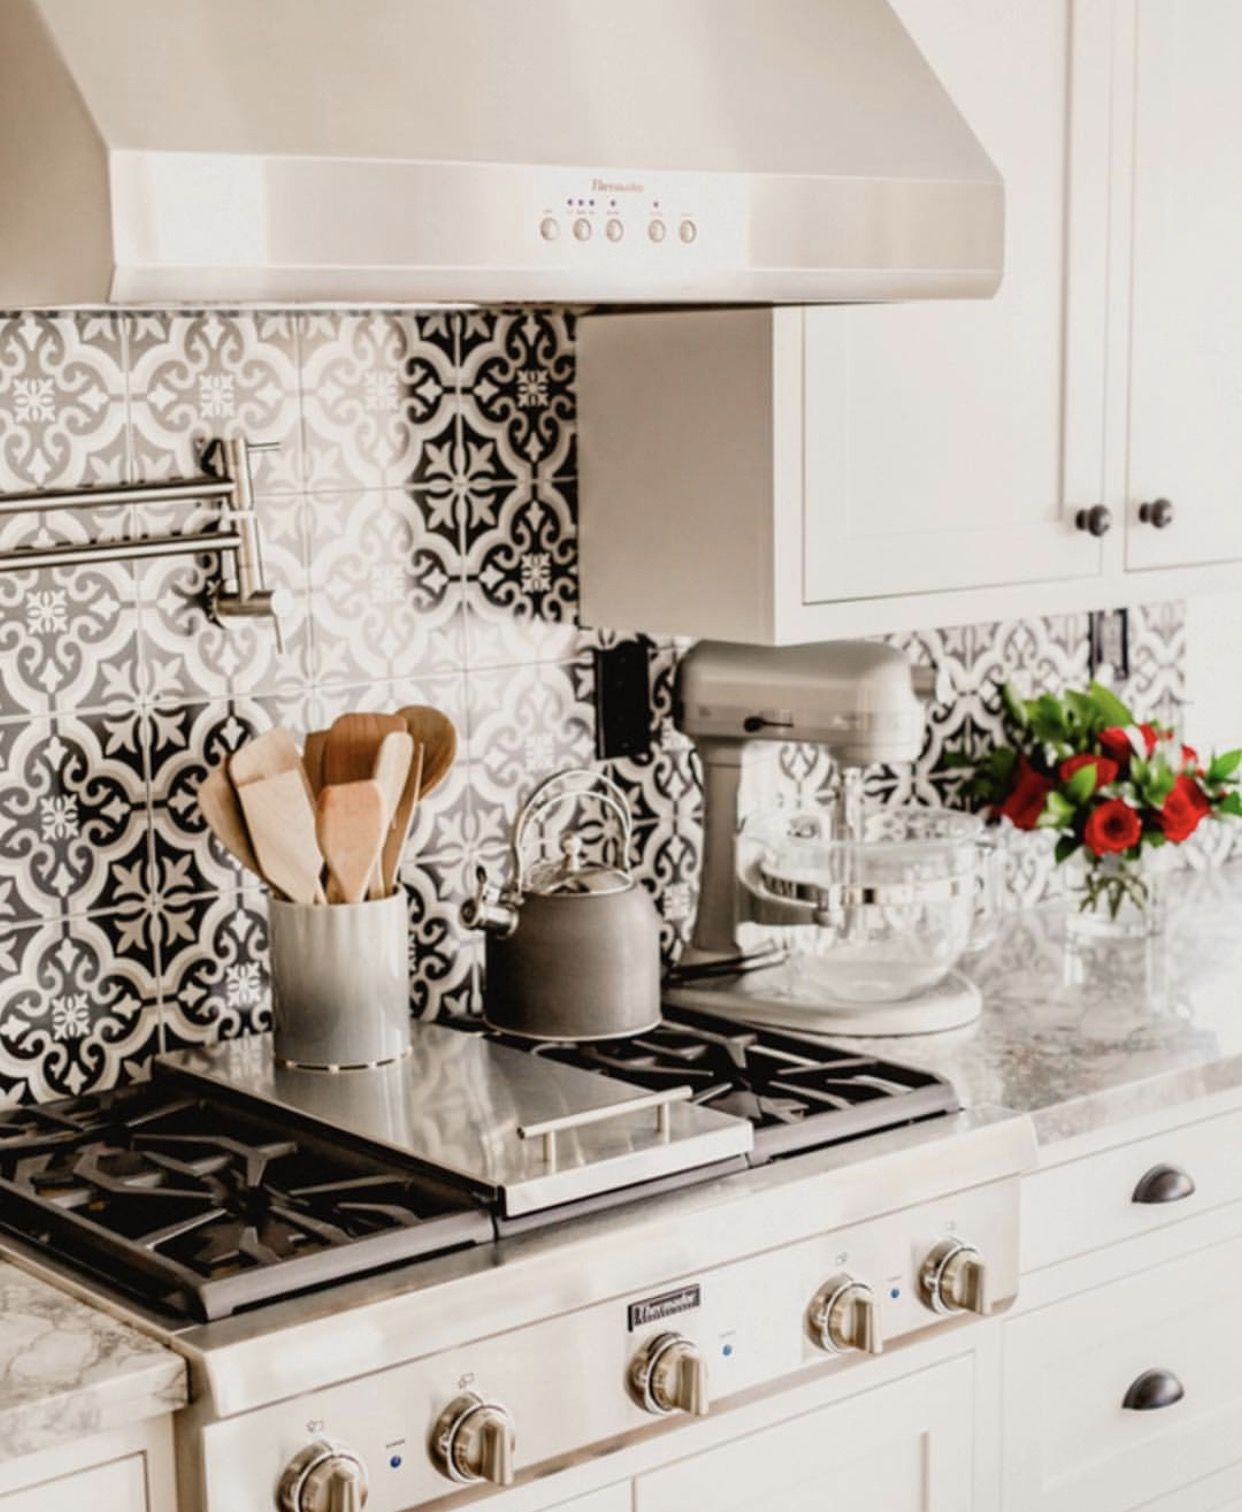 Black White Kitchen Backsplash Ideas: This Kitchen Backsplash Is Amazing. Black And White Tile